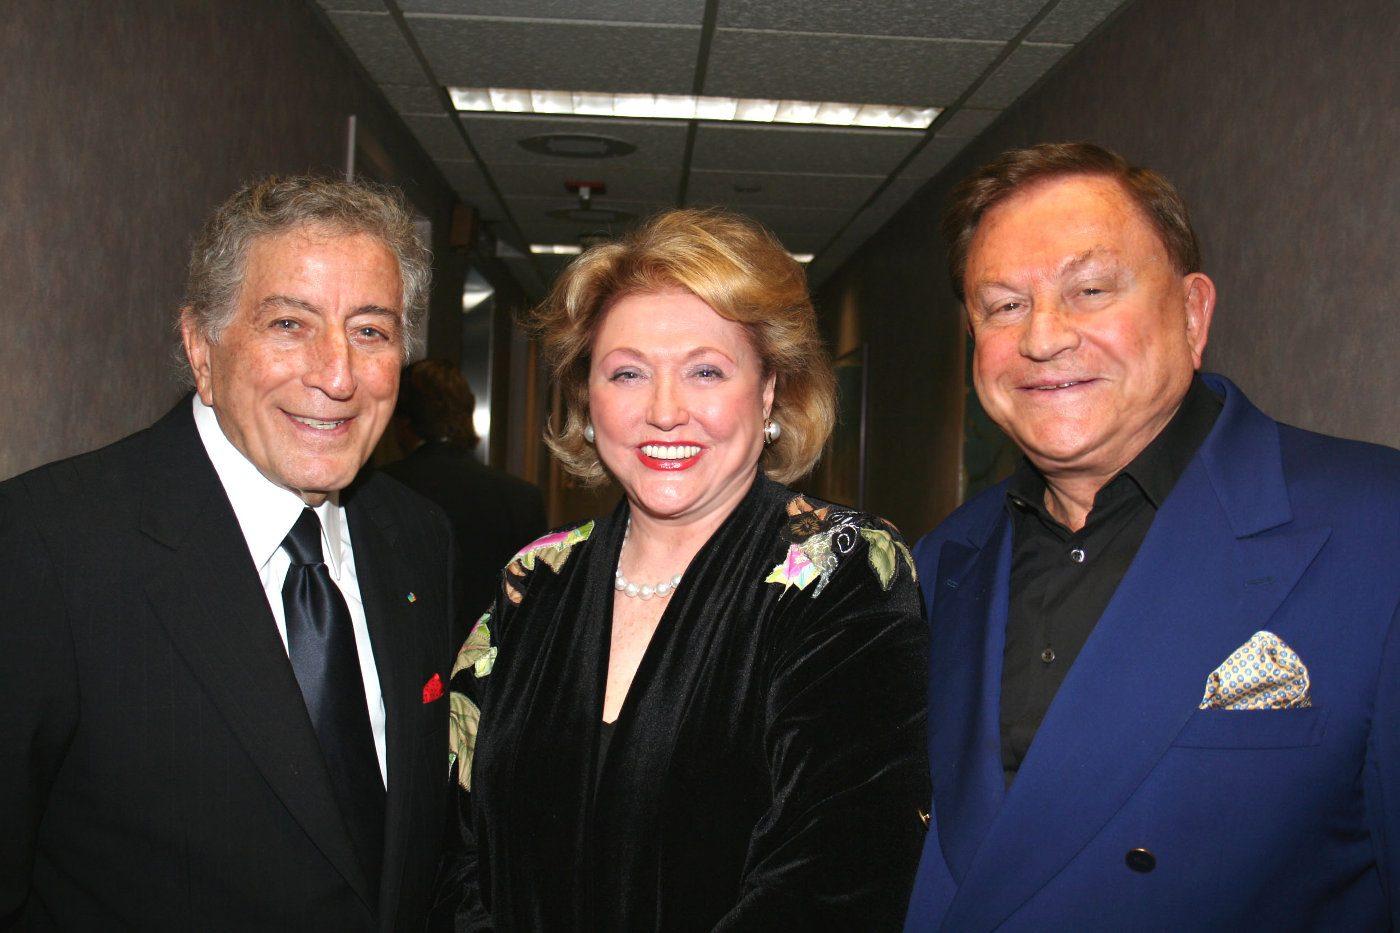 Barbara Taylor Bradford, Robert Bradford pictured with Tony Bennett